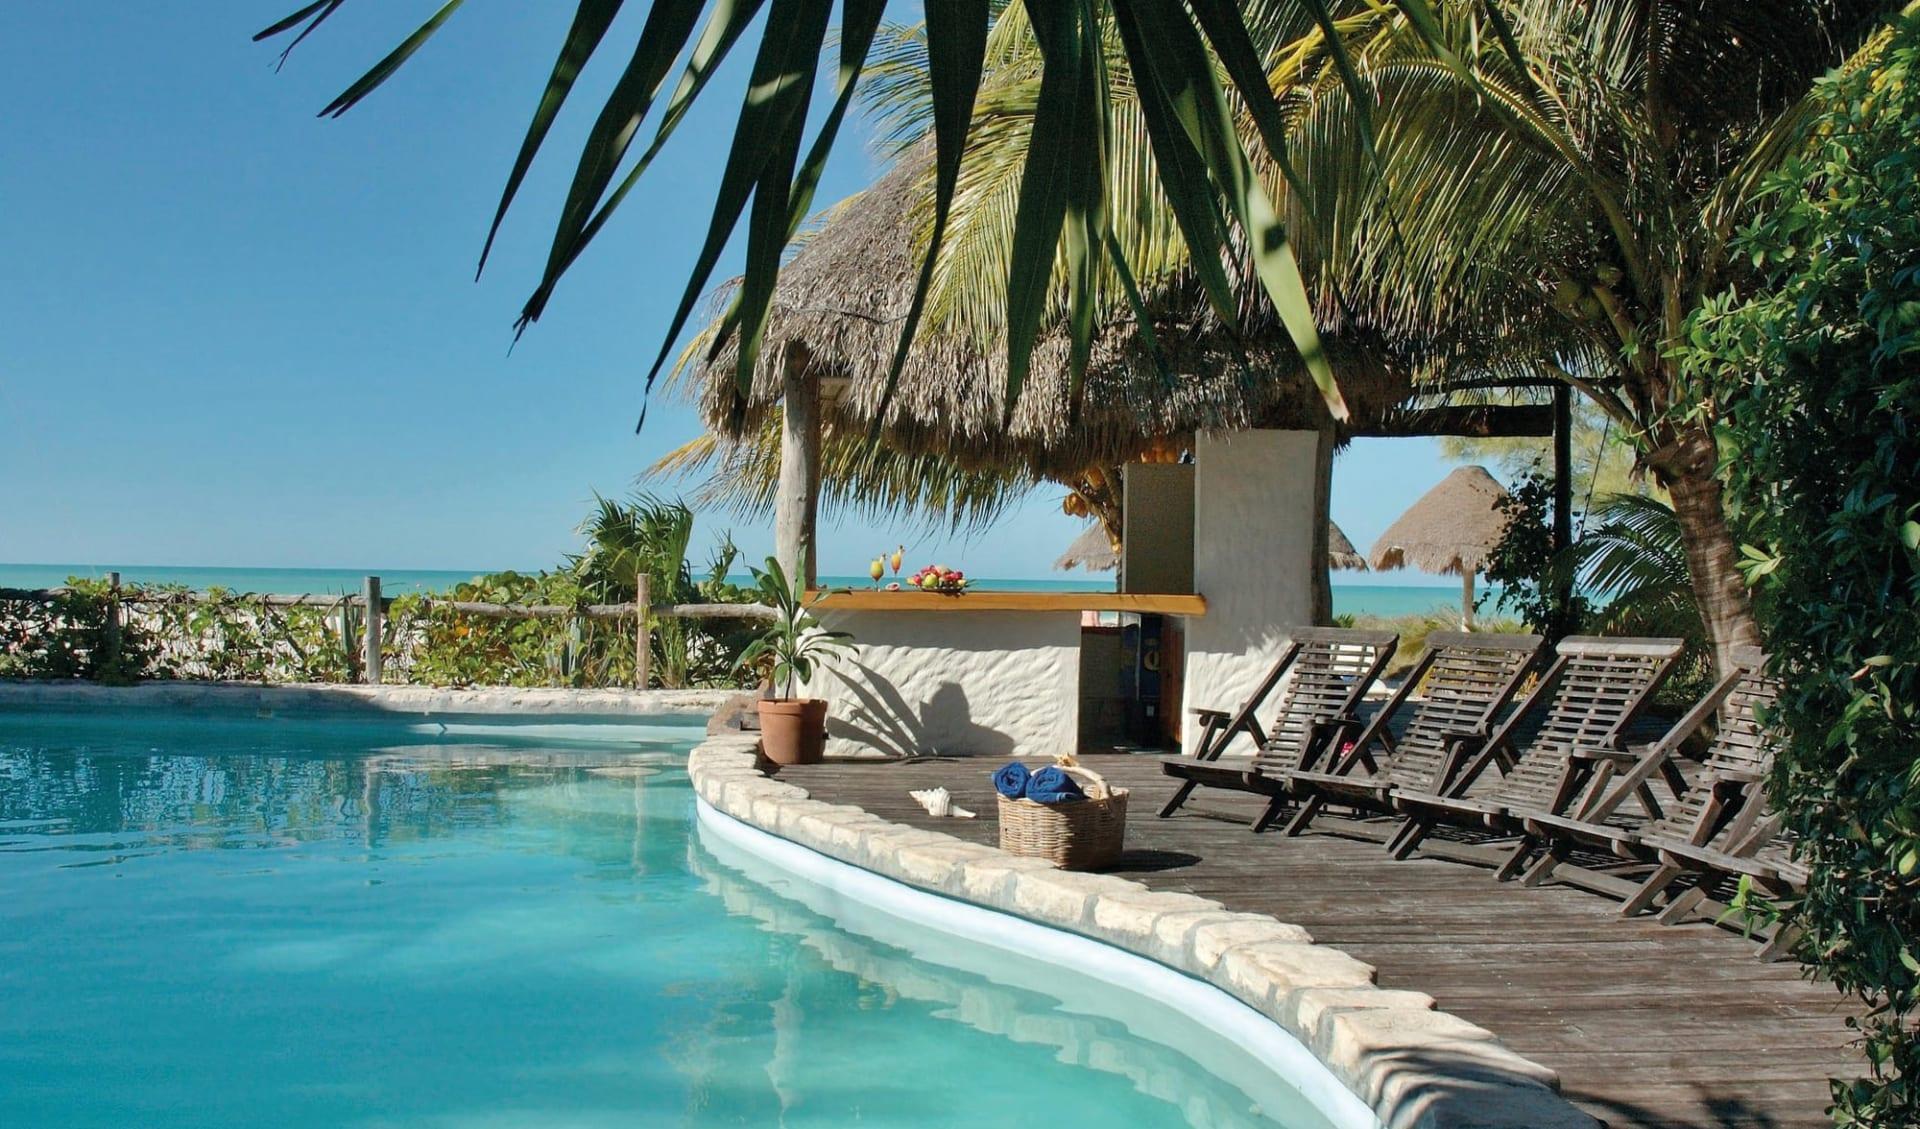 Xaloc Resort in Isla Holbox:  Xaloc Resort Holbox - Pool C Latin Connect